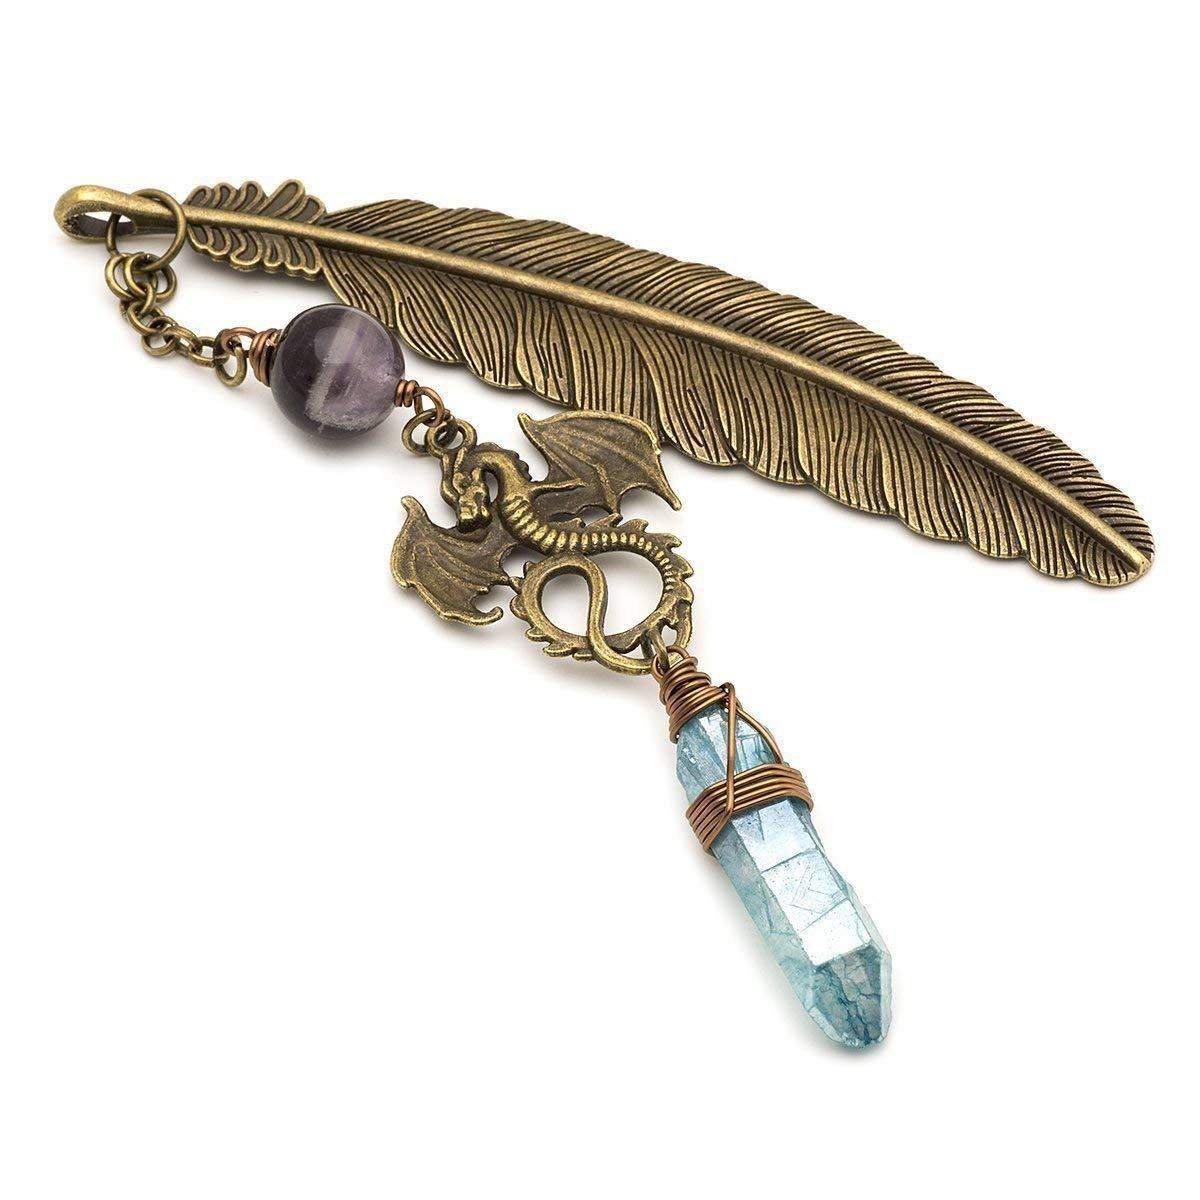 Aura quartz amethyst gemstone point dragon and feather bronze metal unique bookmark gift